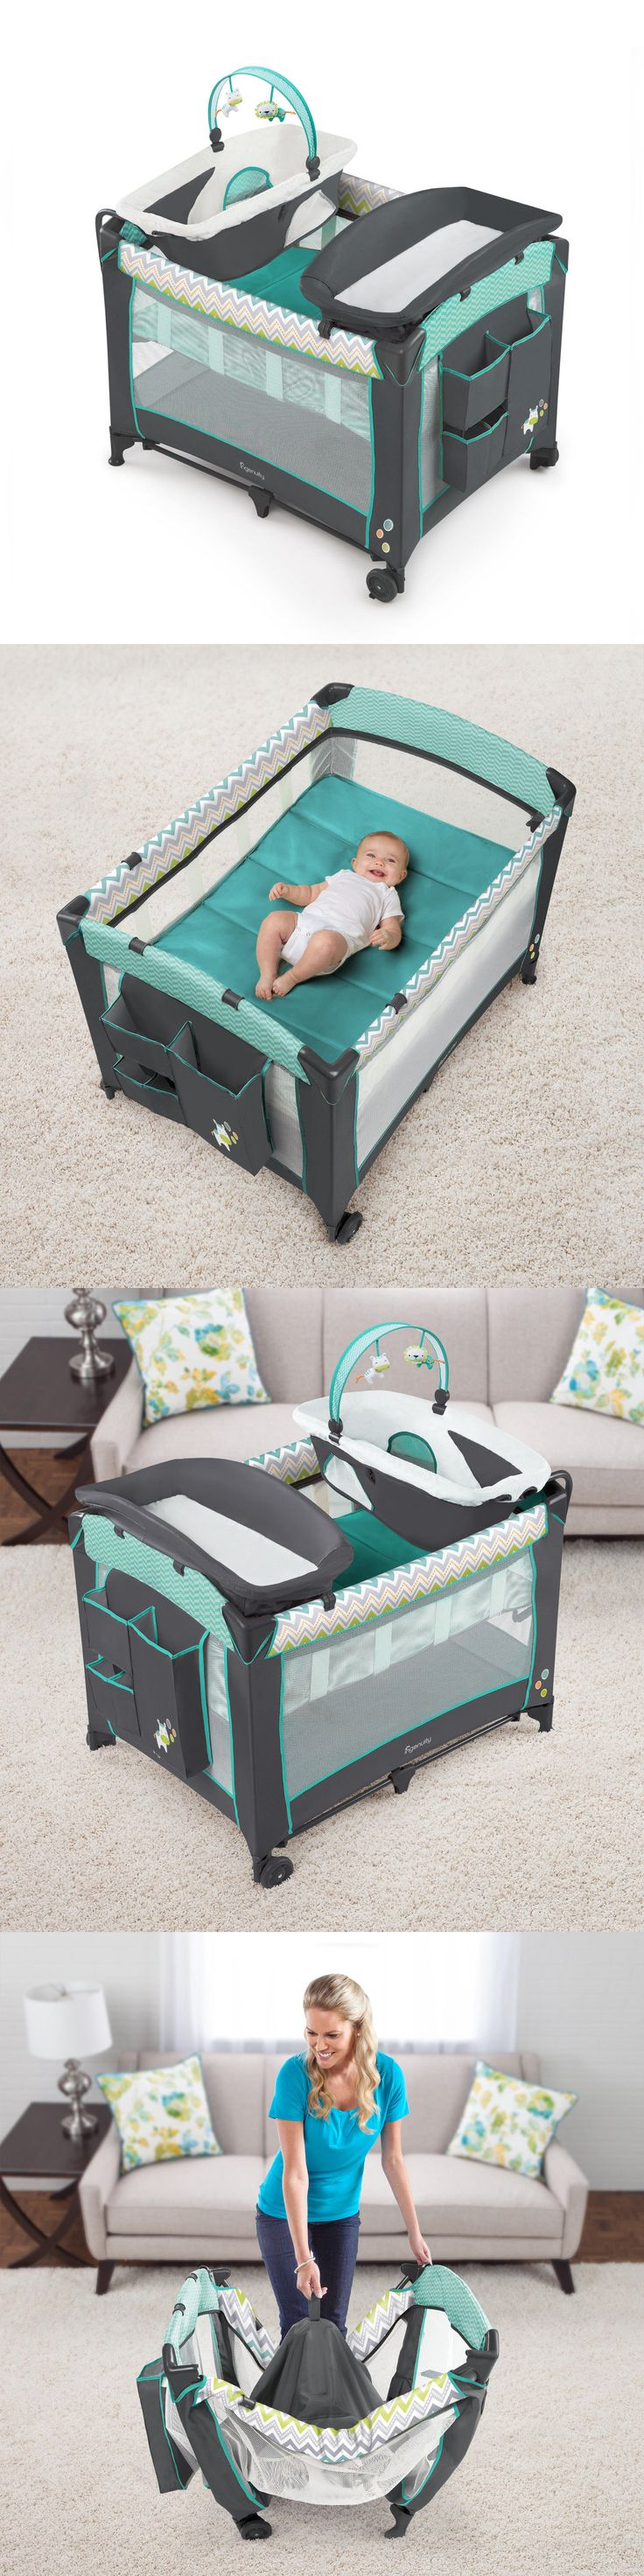 Baby Nursery: Baby Nursery Bassinet Infant Sleeper Crib Newborn Playard Folding Changing Table BUY IT NOW ONLY: $108.99